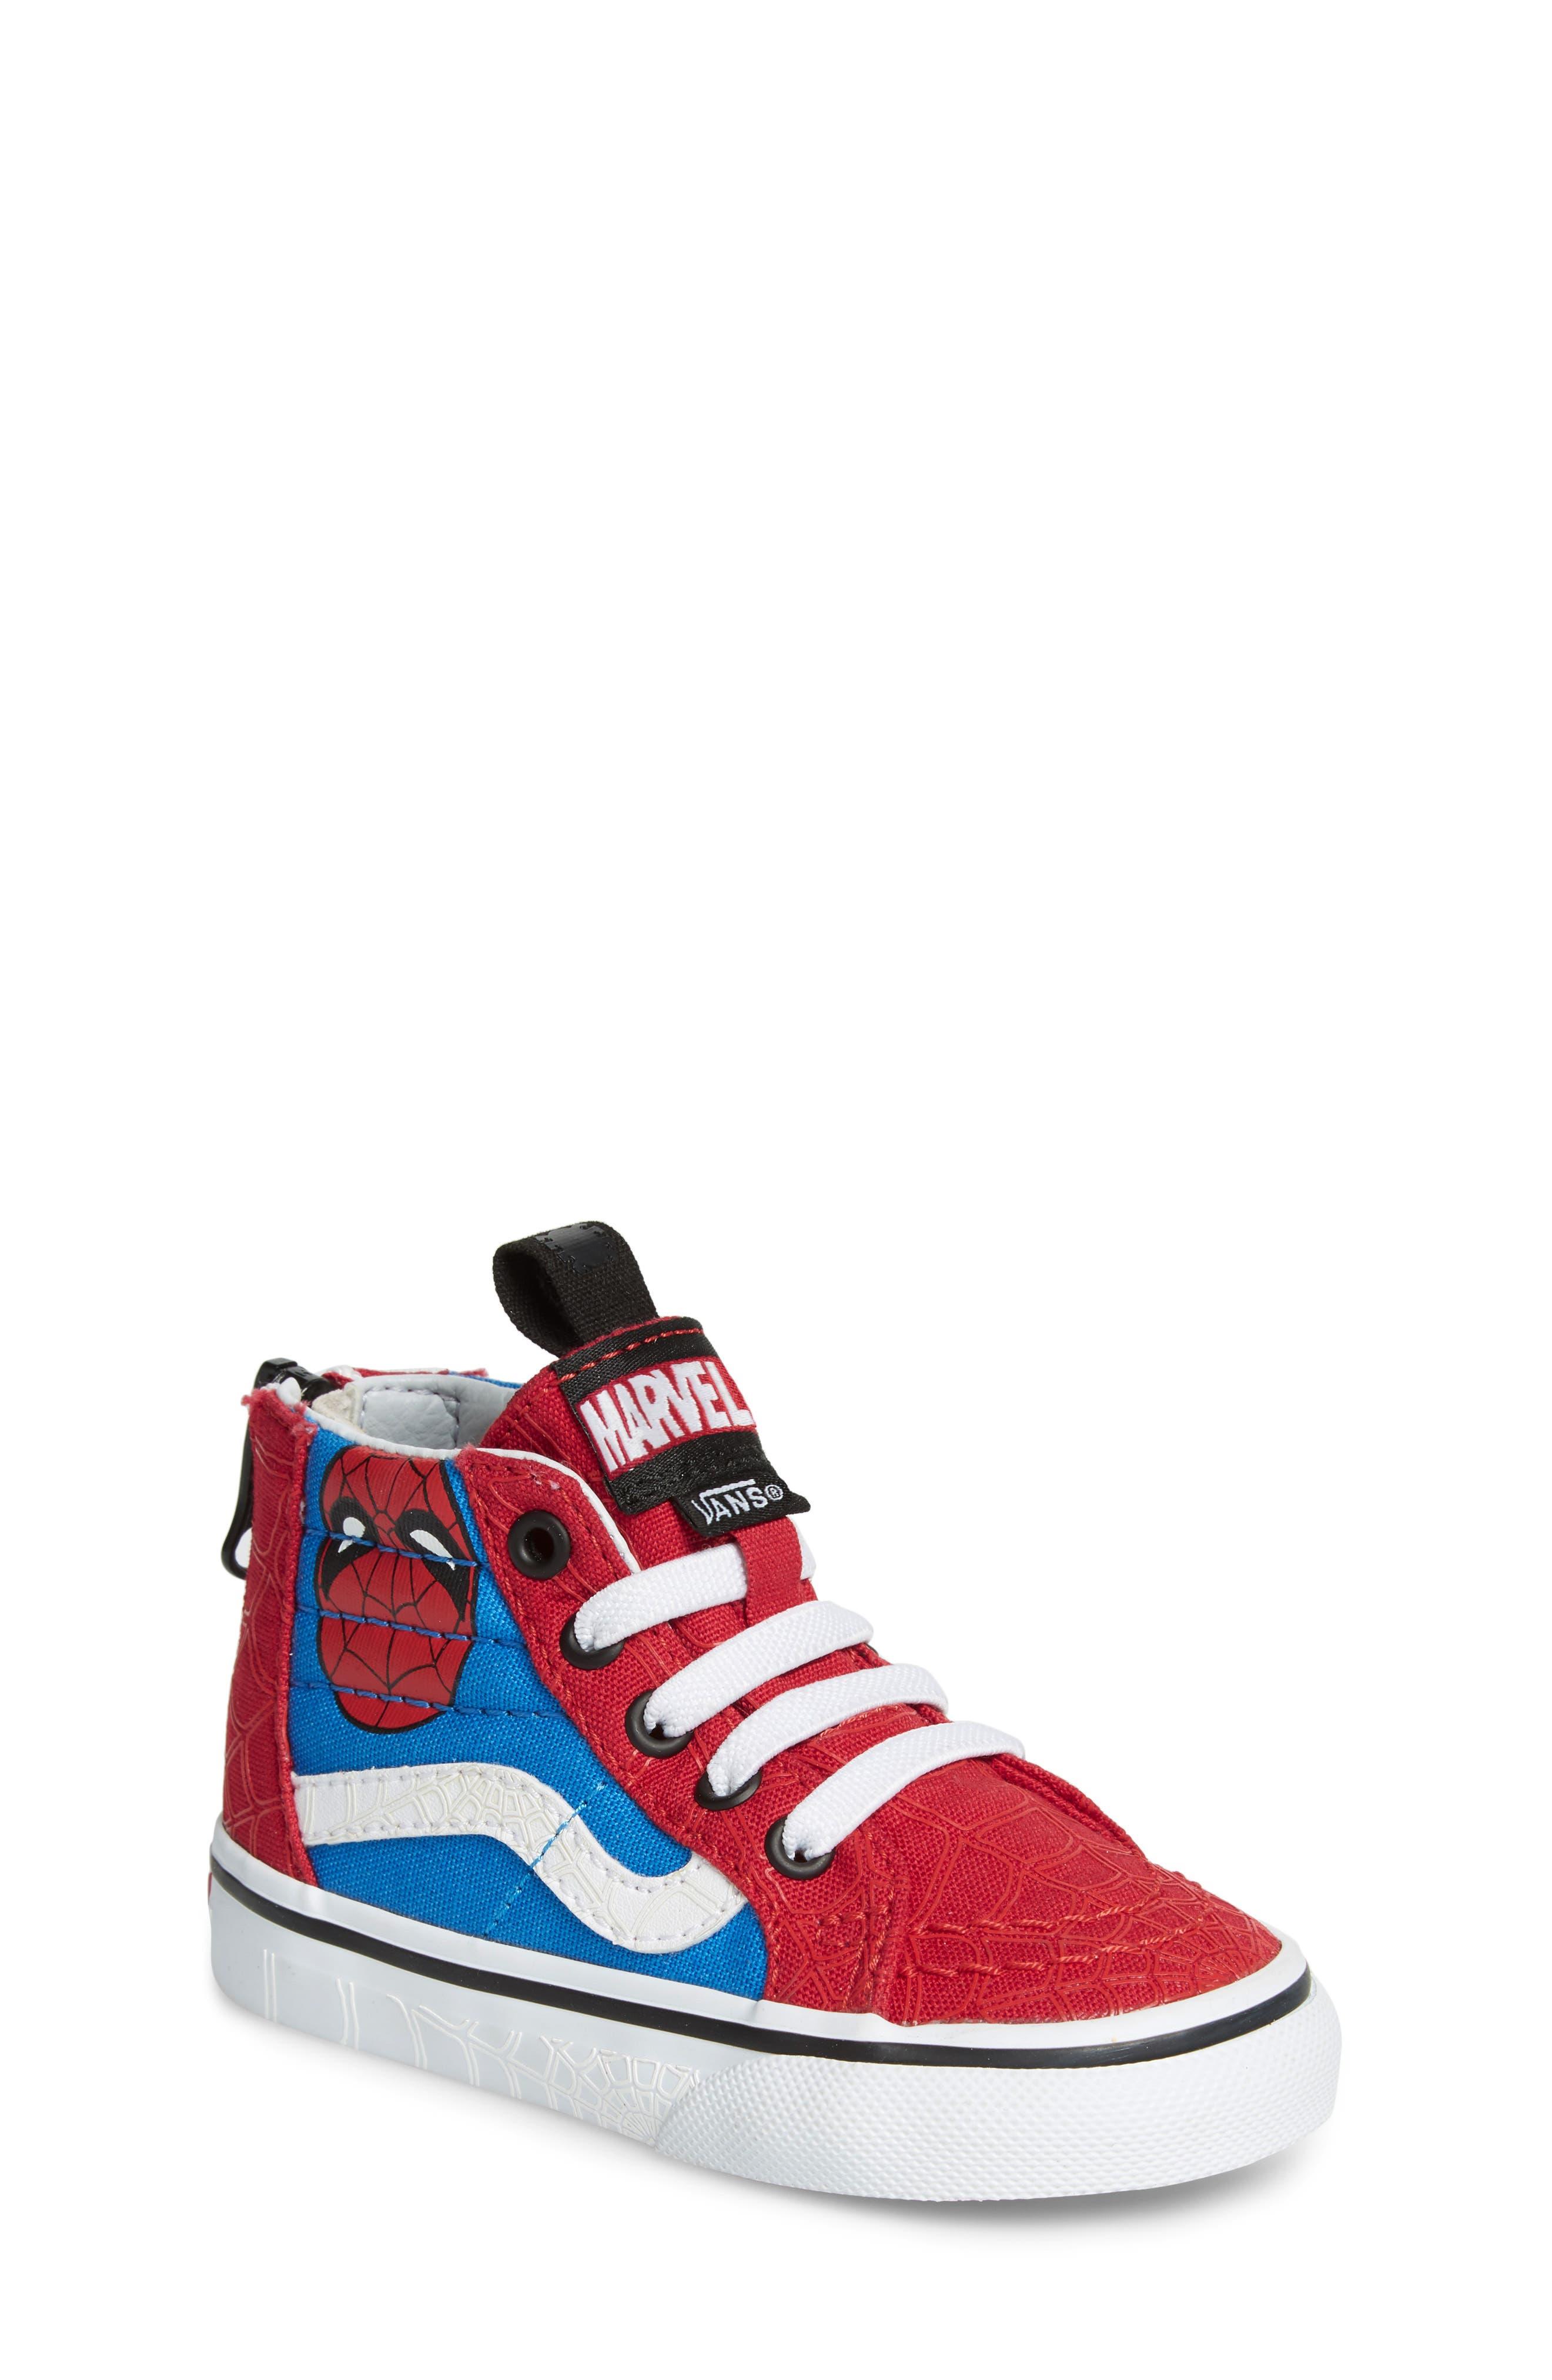 x Marvel<sup>®</sup> Spider-Man SK8-Hi Sneaker,                             Main thumbnail 1, color,                             610